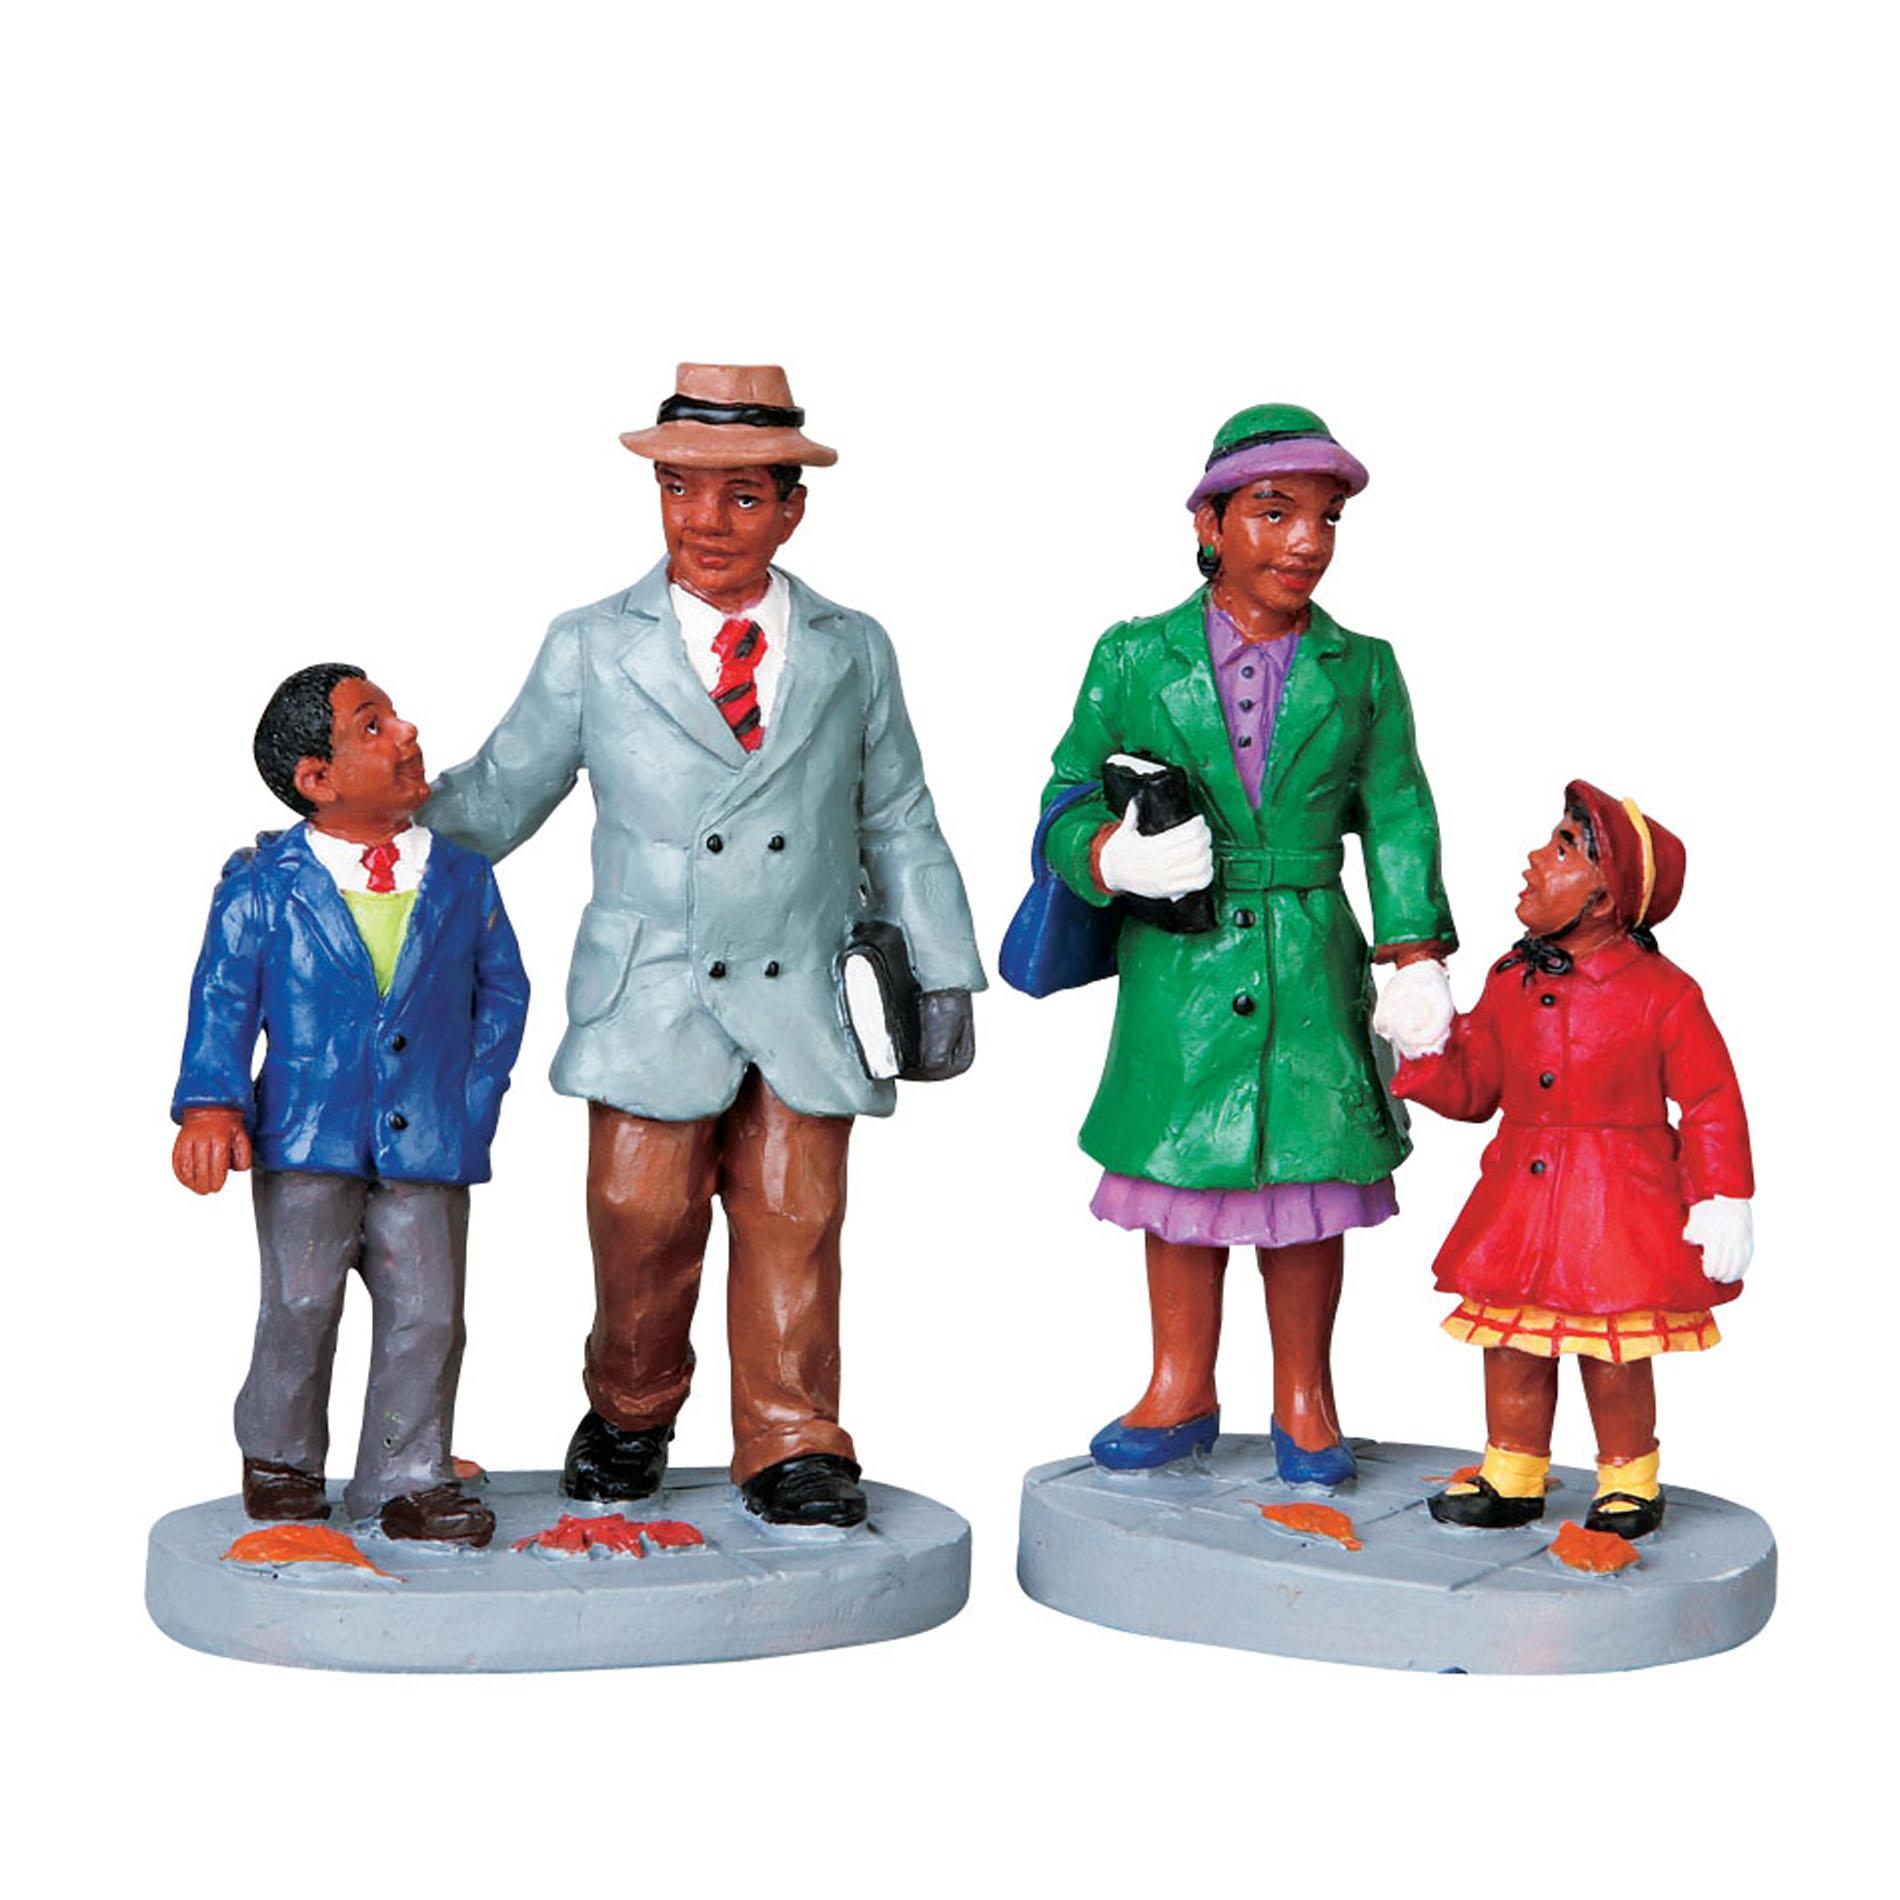 Lemax Village Collection Christmas Village Figurine Going